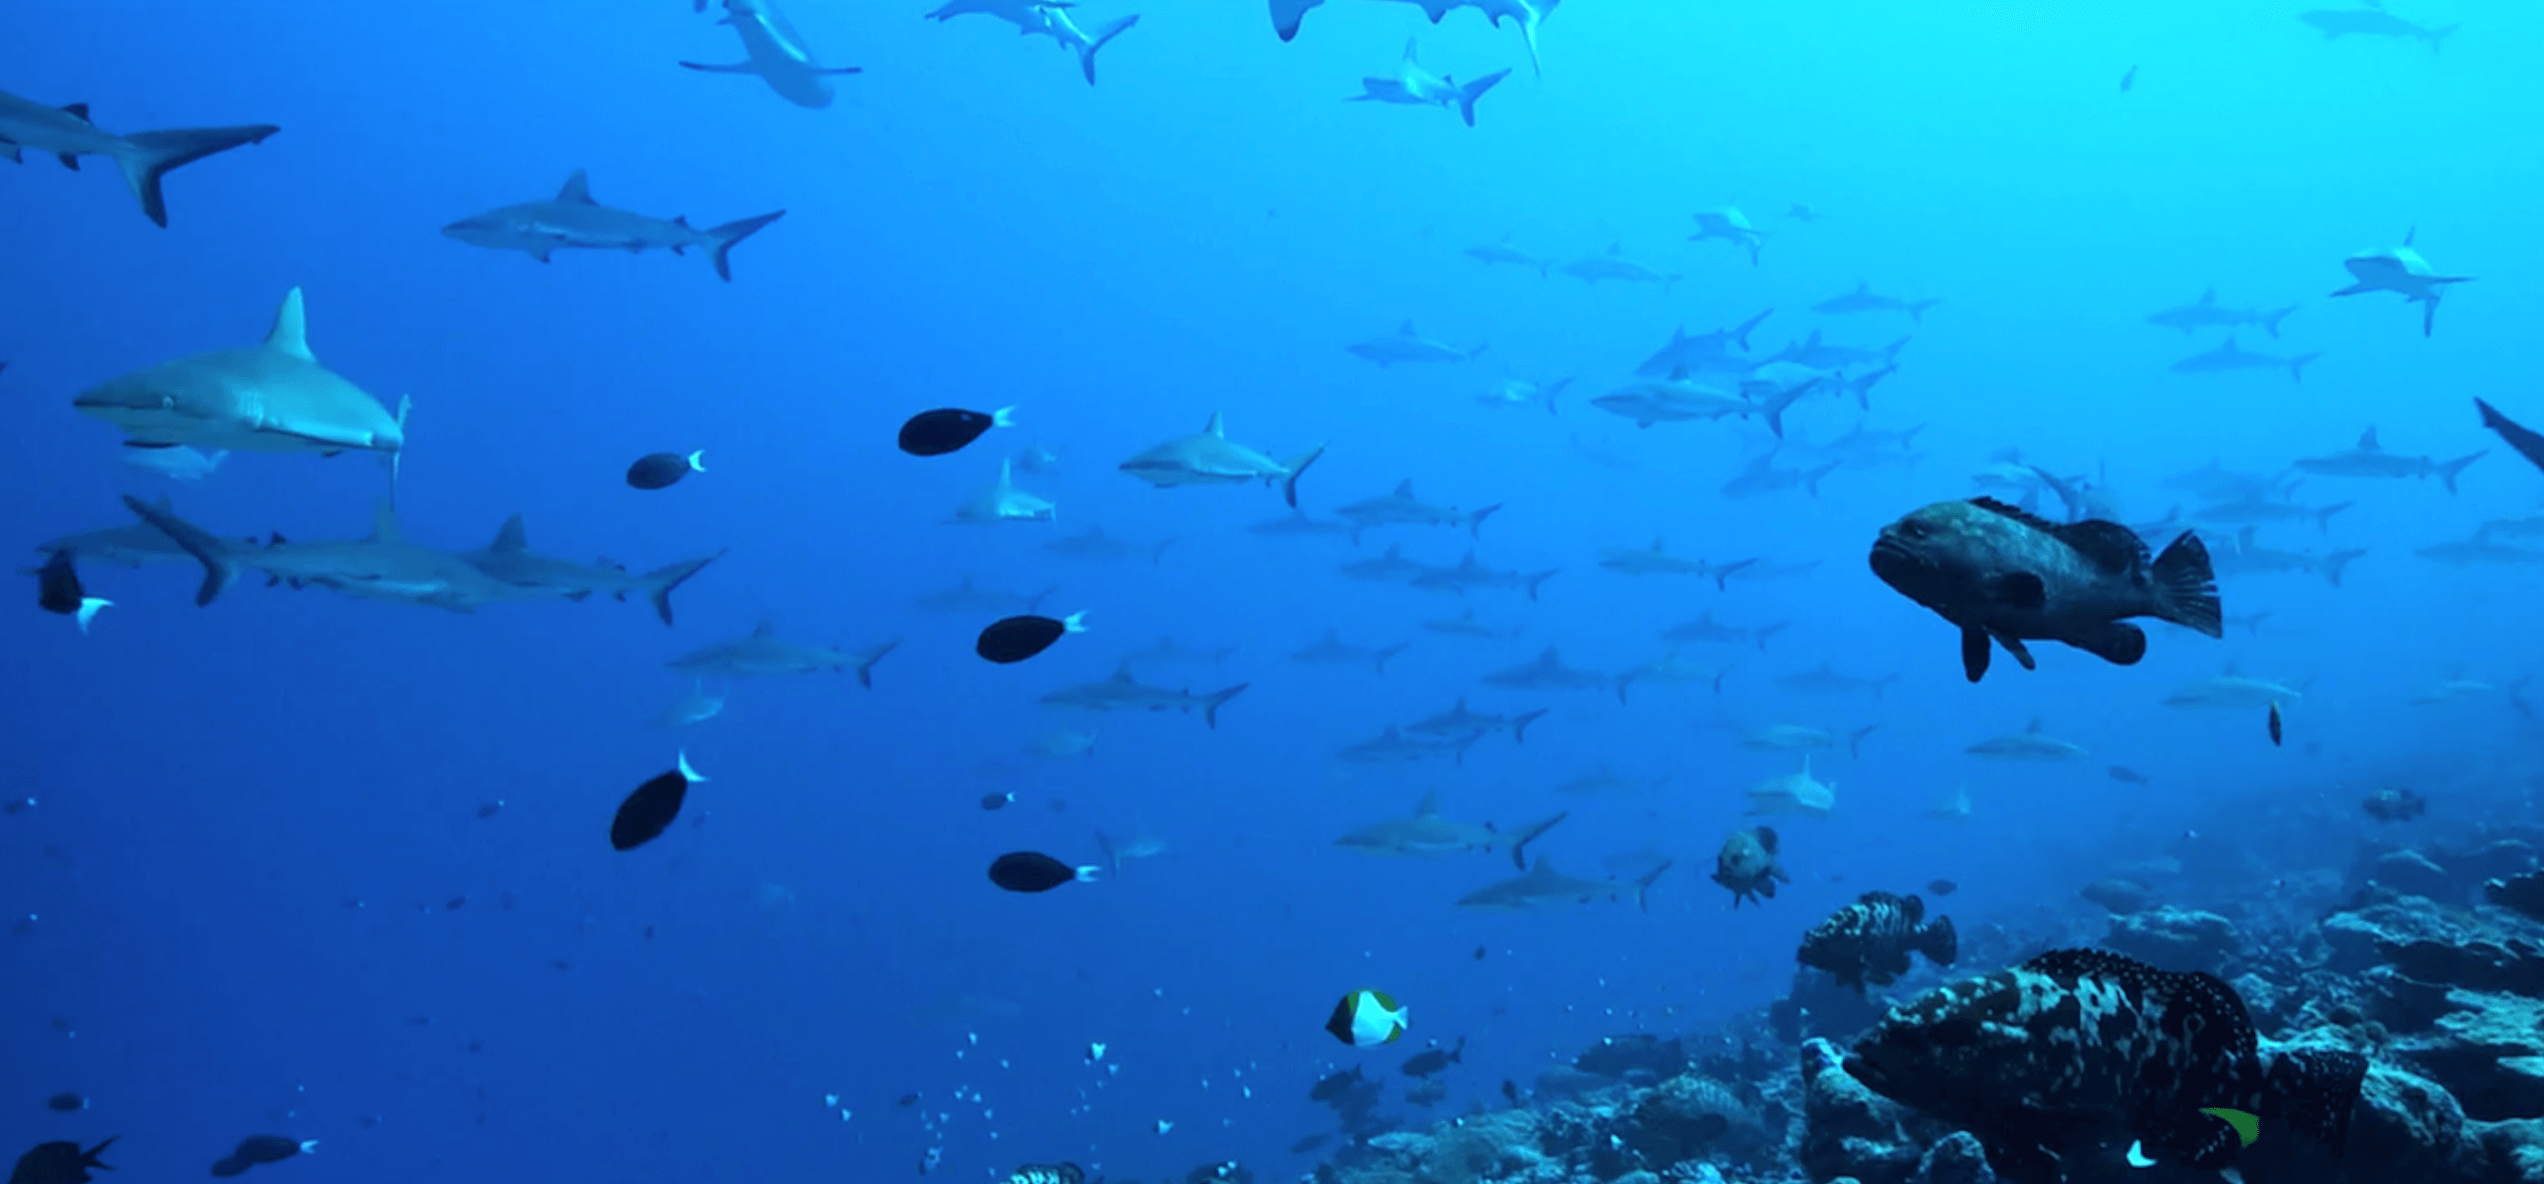 requin fakarava ailerons